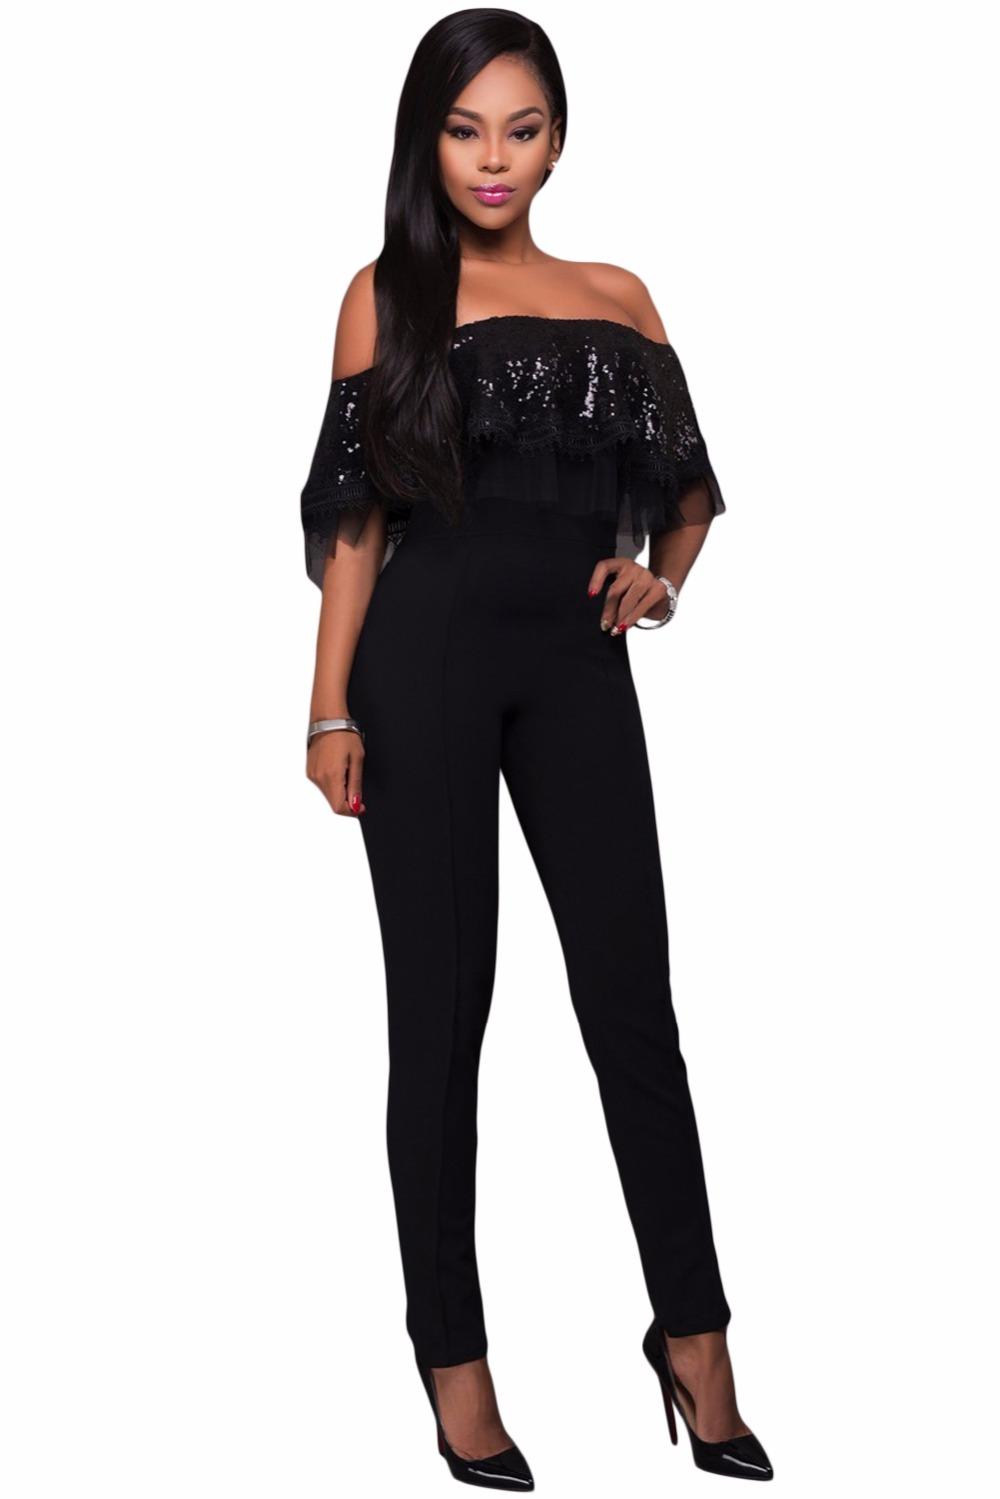 Black-Sequin-Ruffle-Top-Jumpsuit-LC64249-2-2